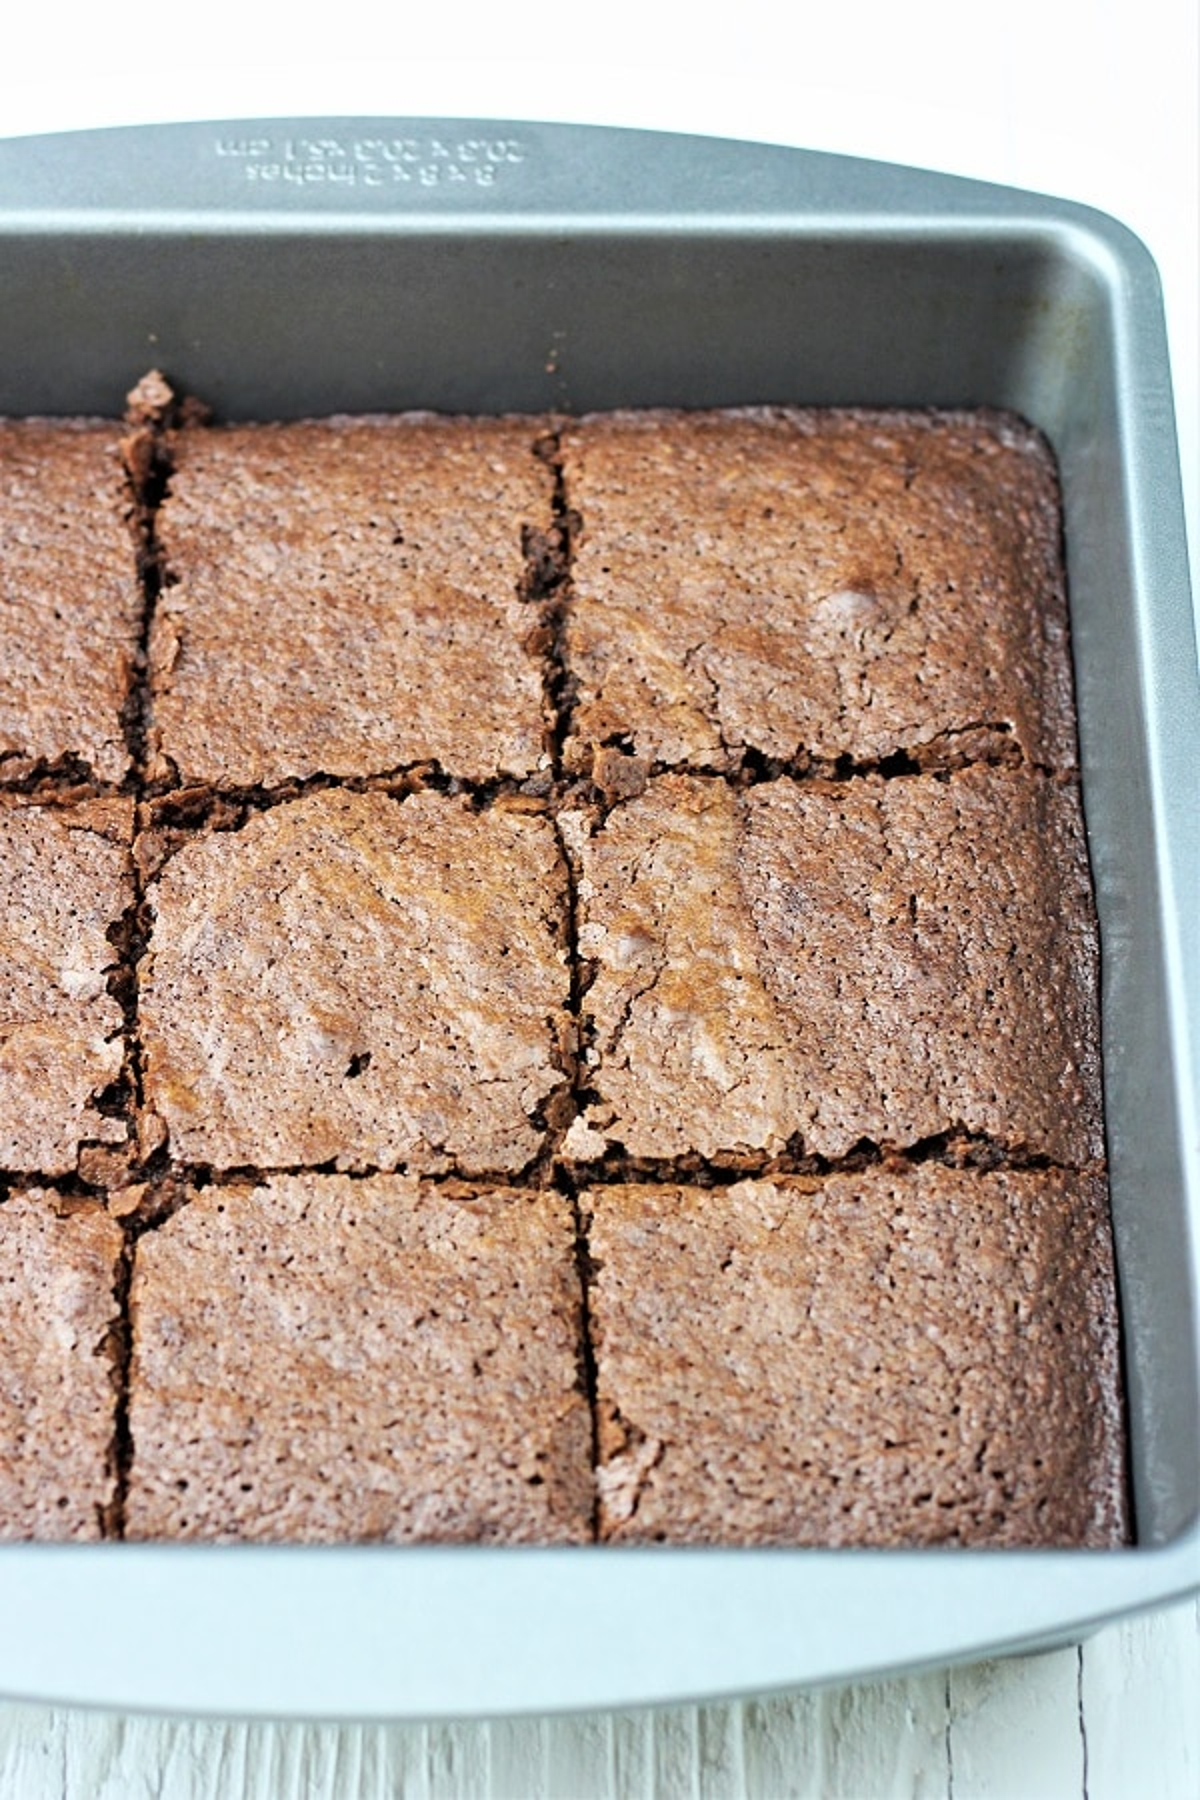 pan of brownies cut into squares